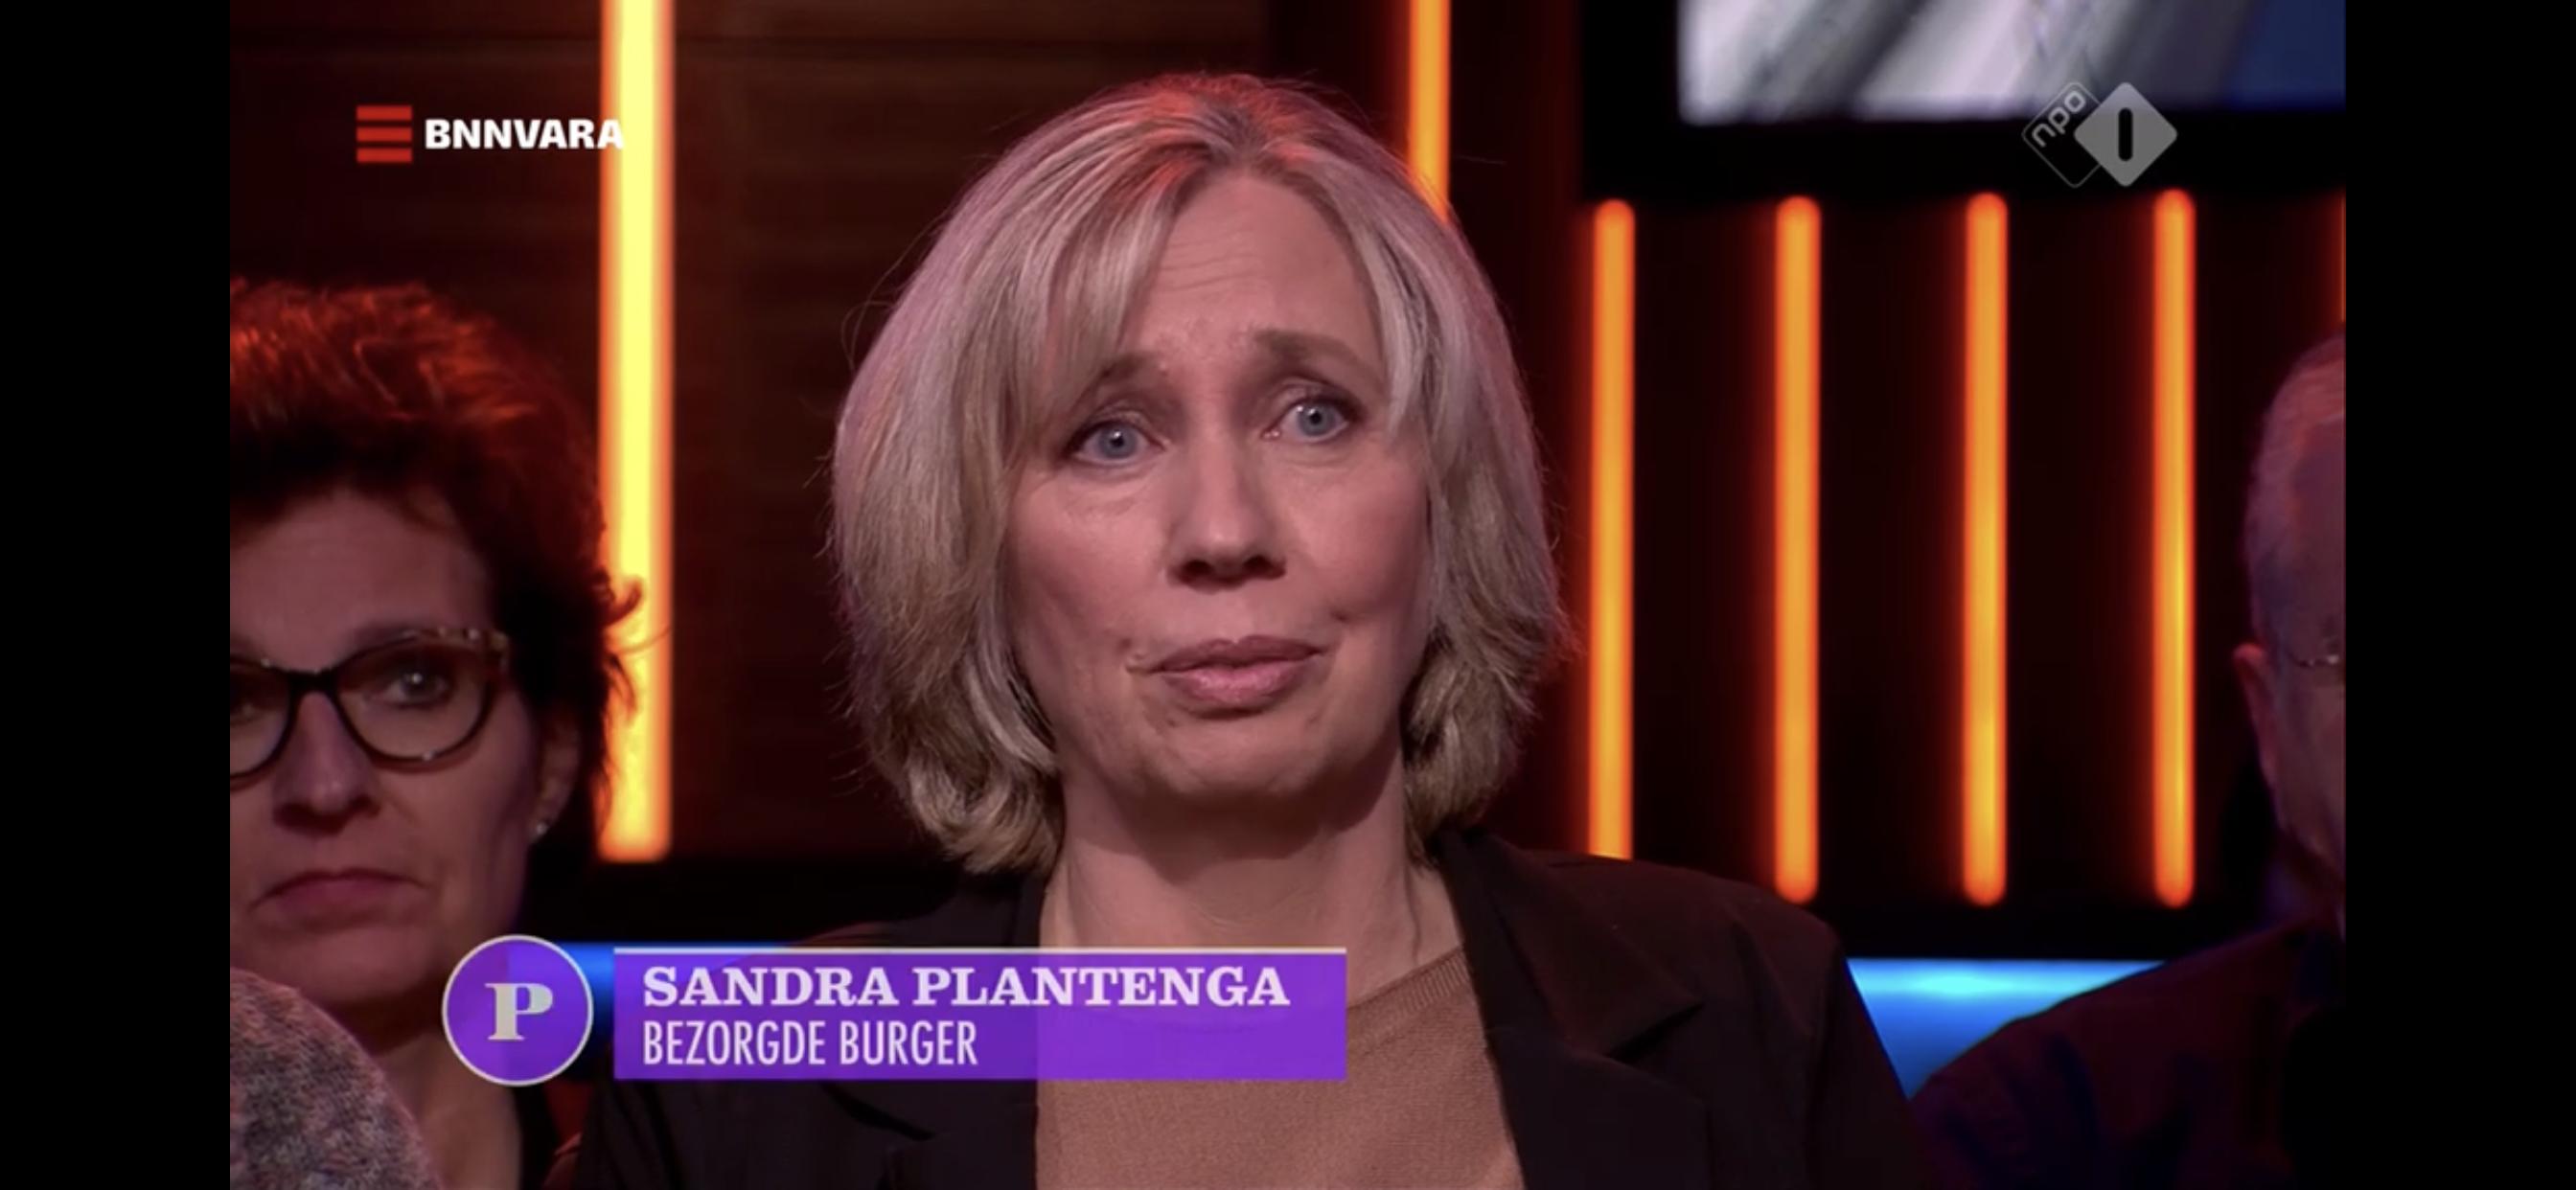 Sandra Plantenga